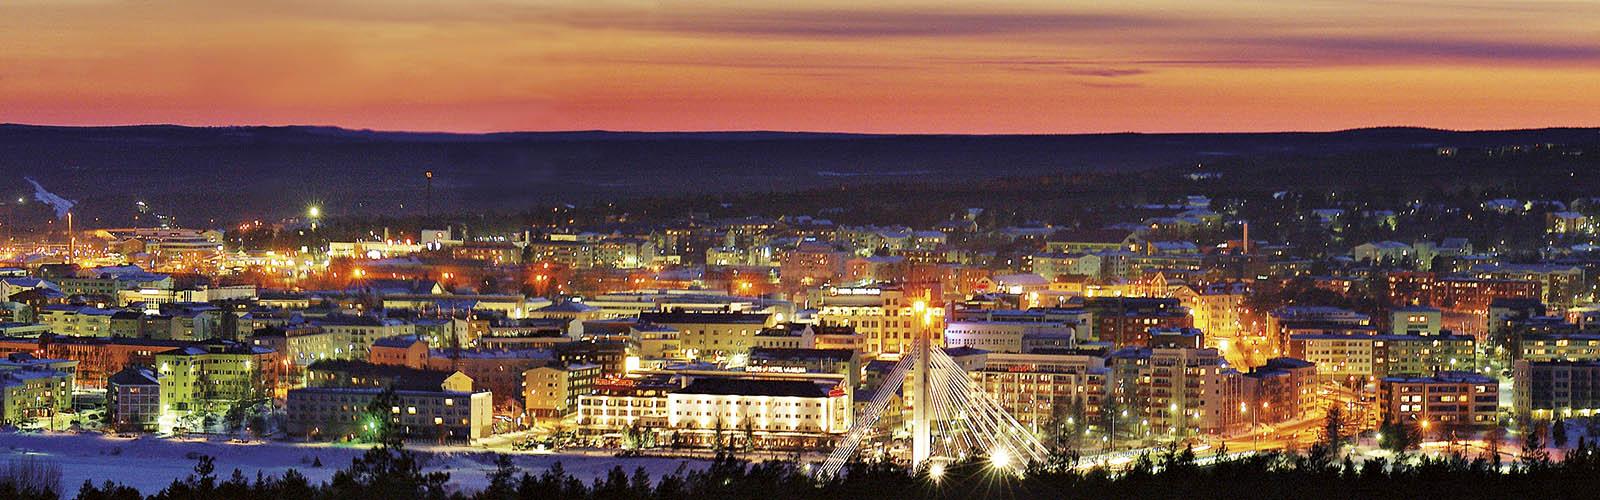 työ ja perhe Rovaniemi